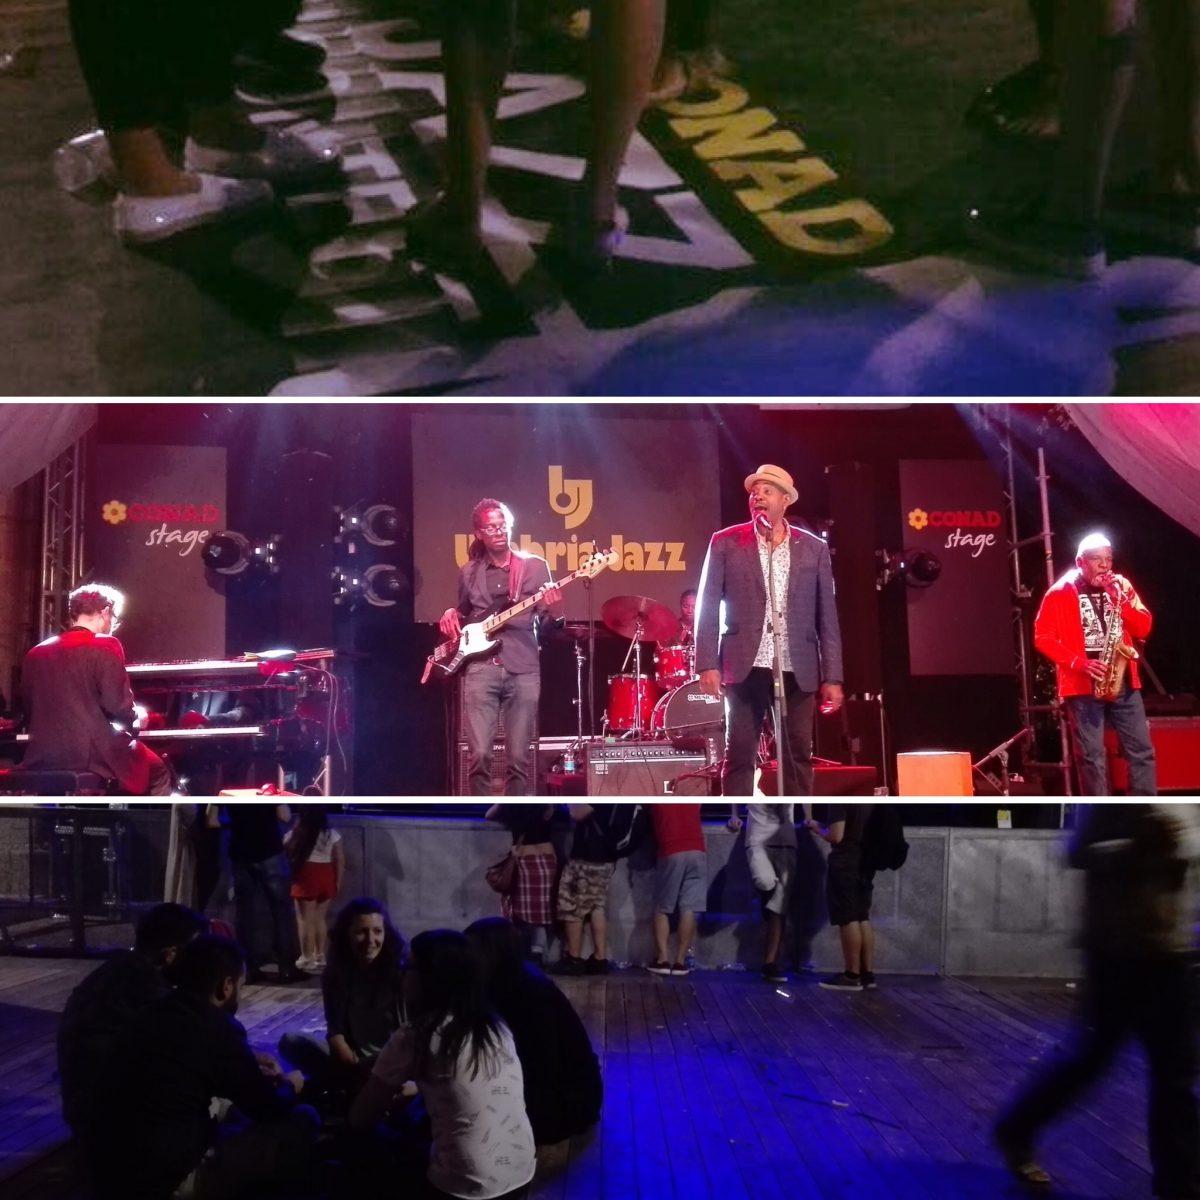 Umbria-Jazz-Giardini-Carducci